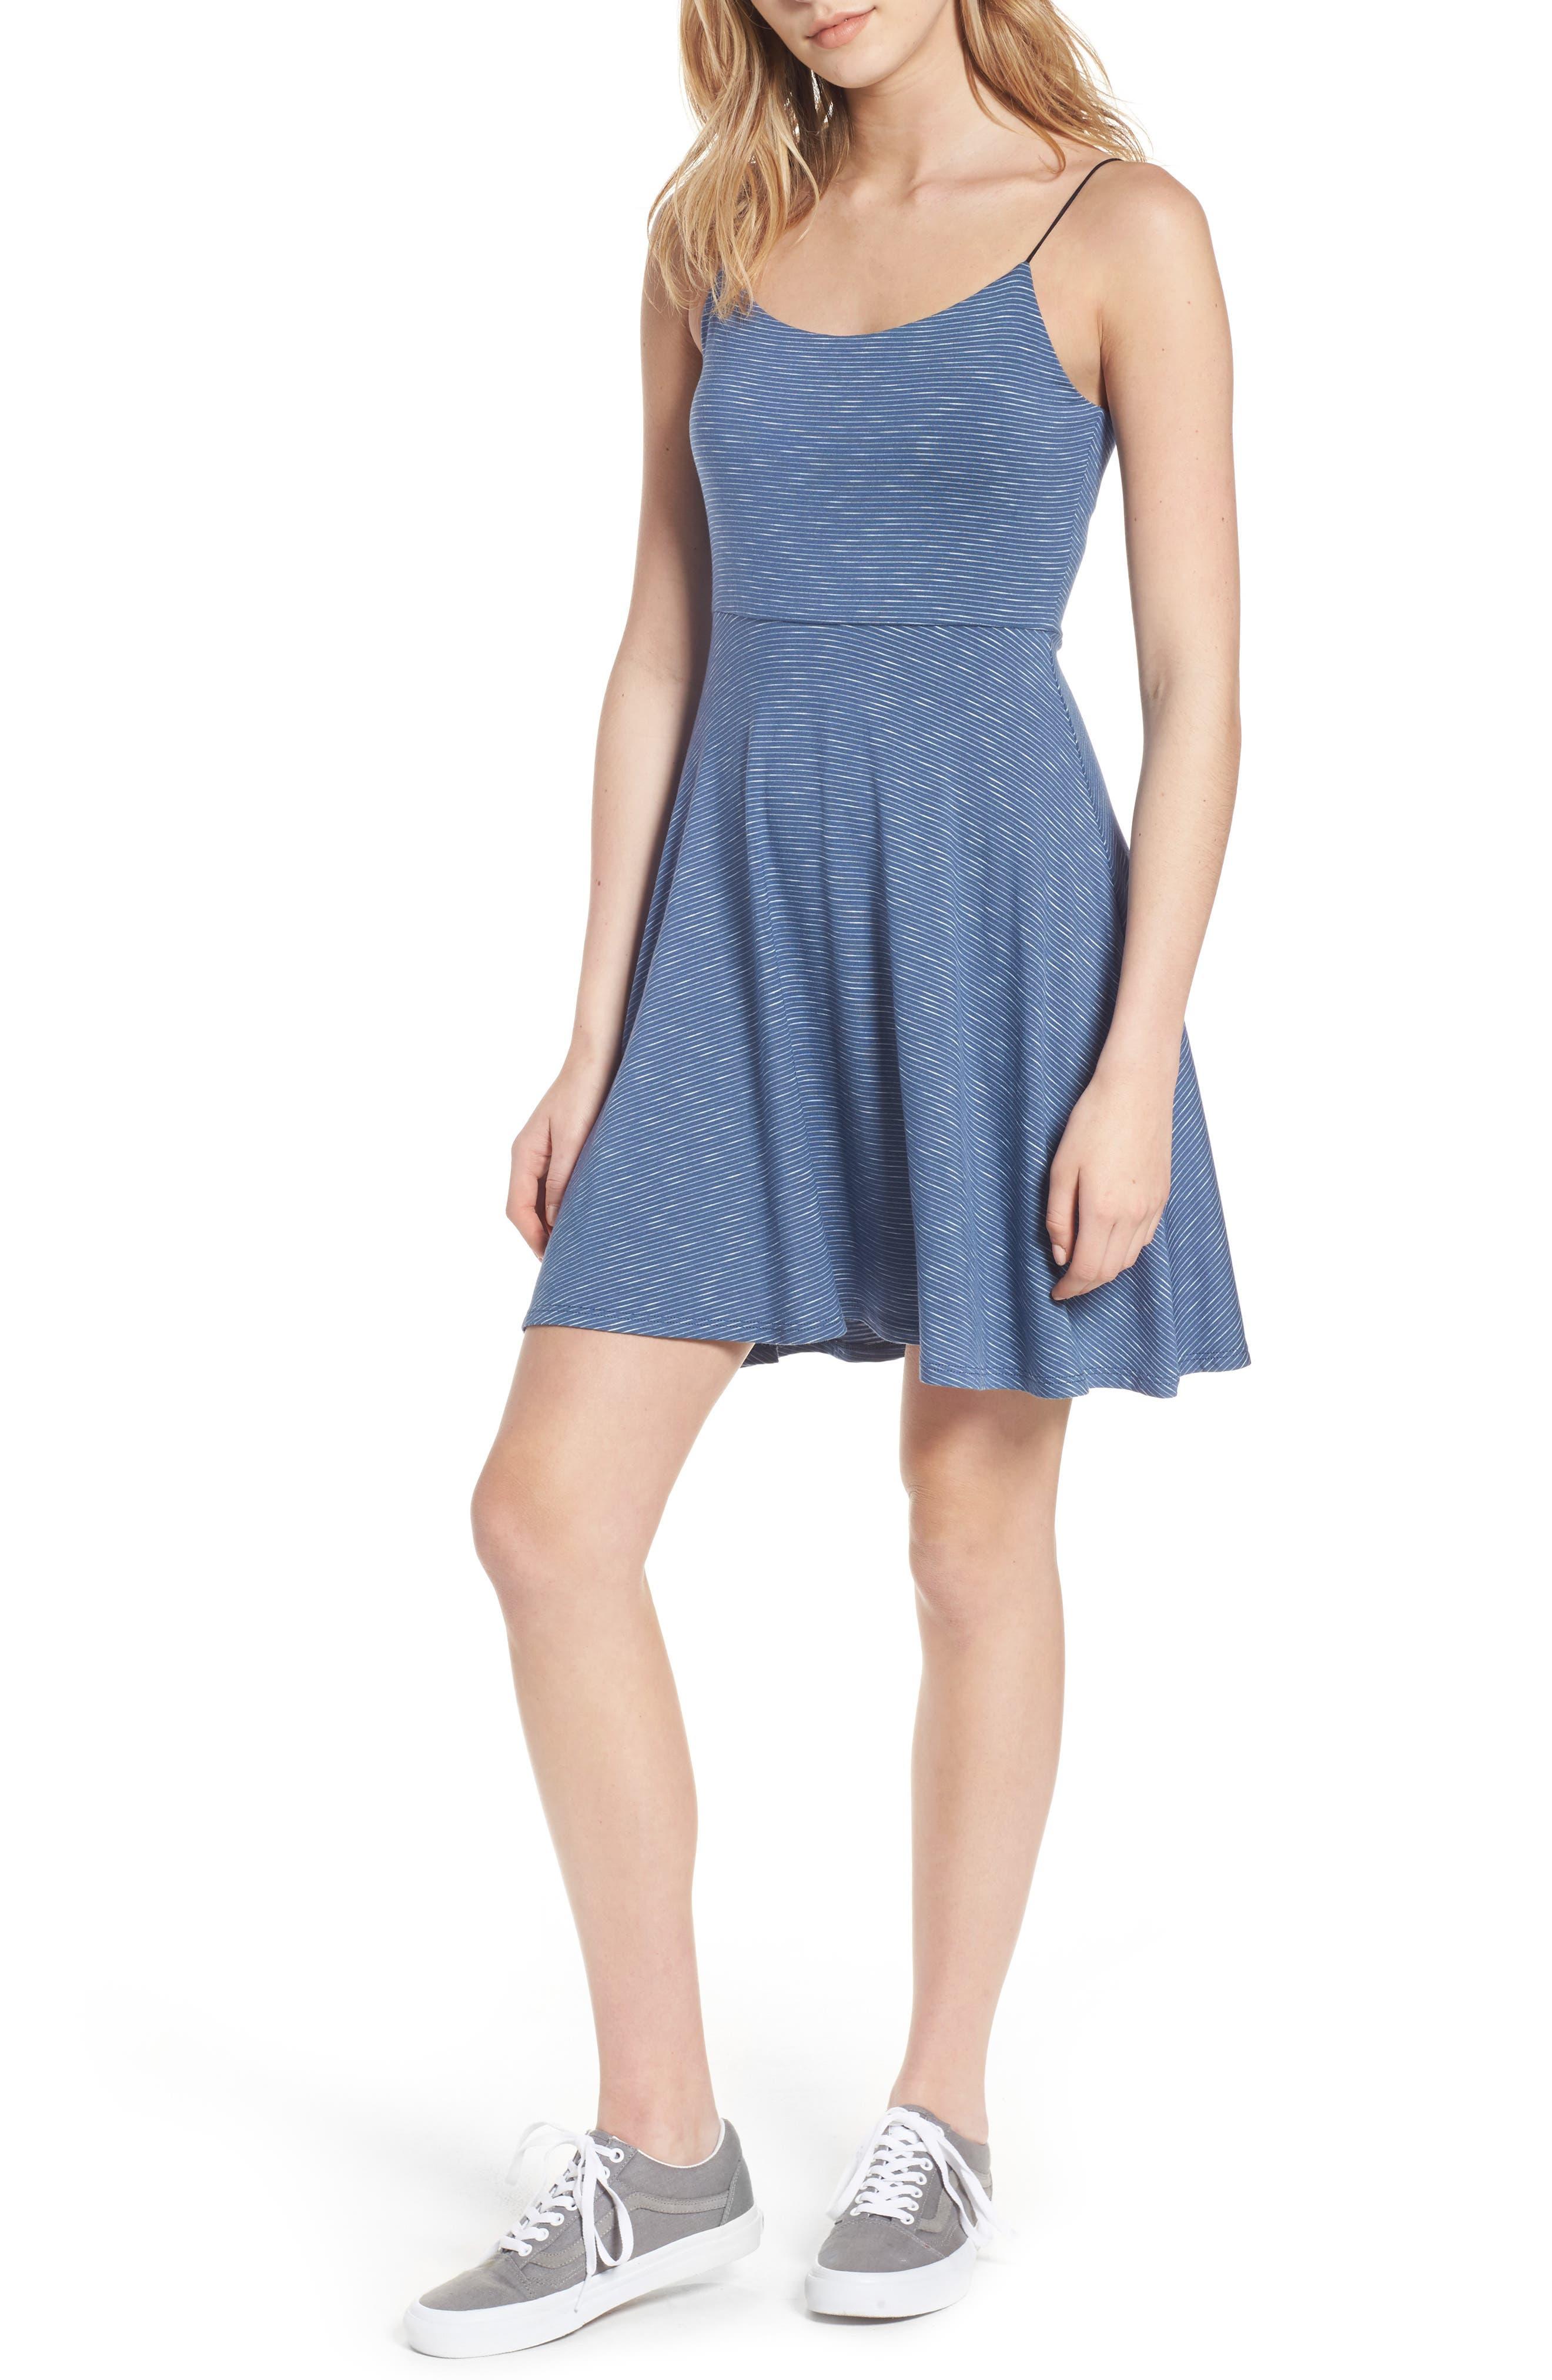 Lush Fit & Flare Dress